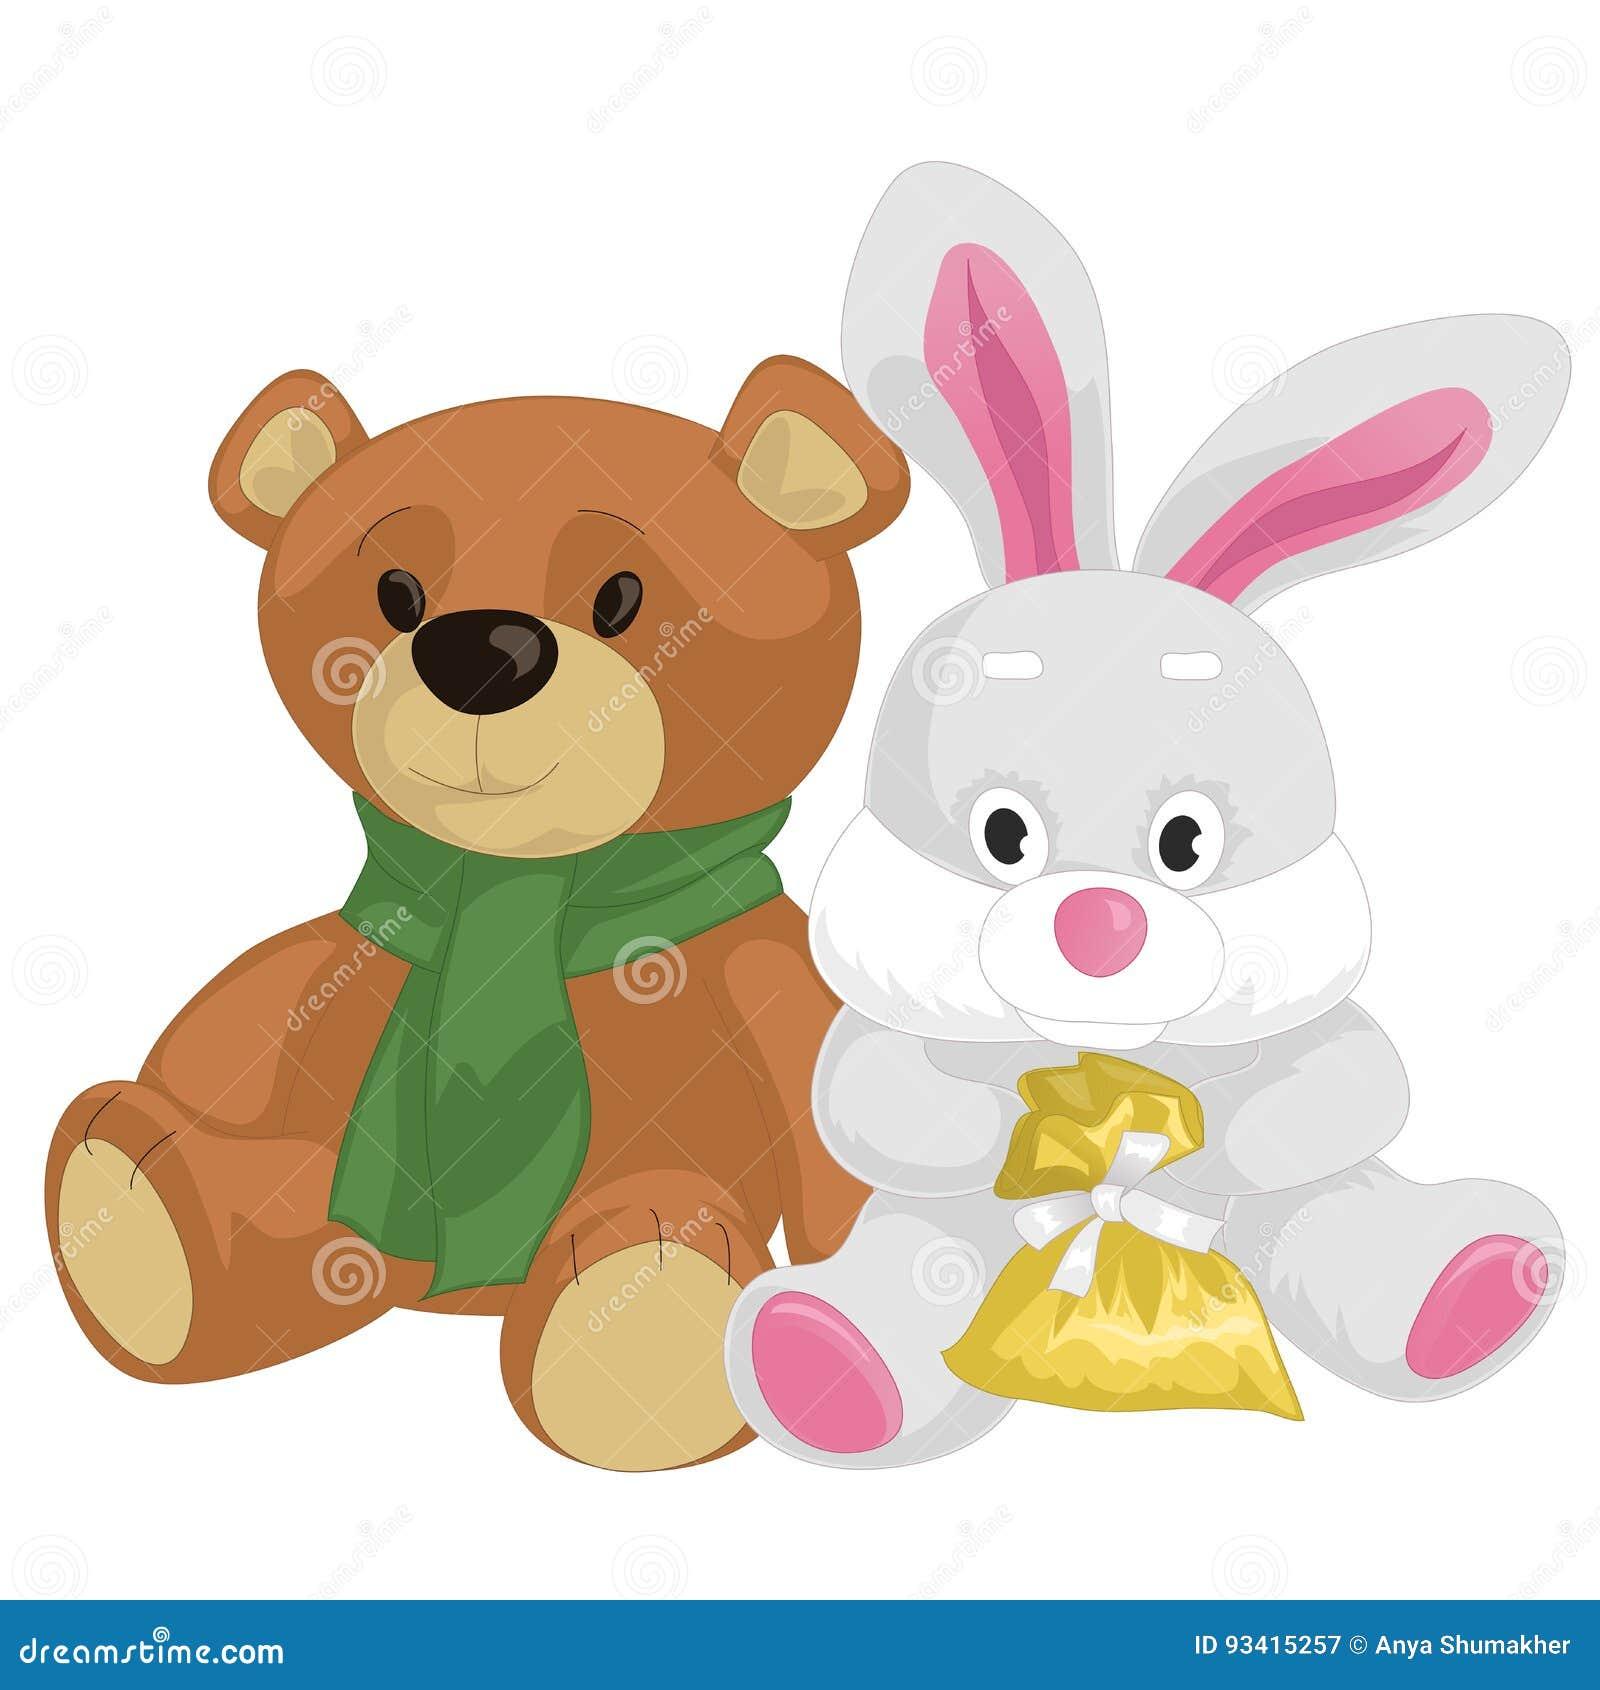 cute toy teddy bear and rabbit stock illustration illustration of